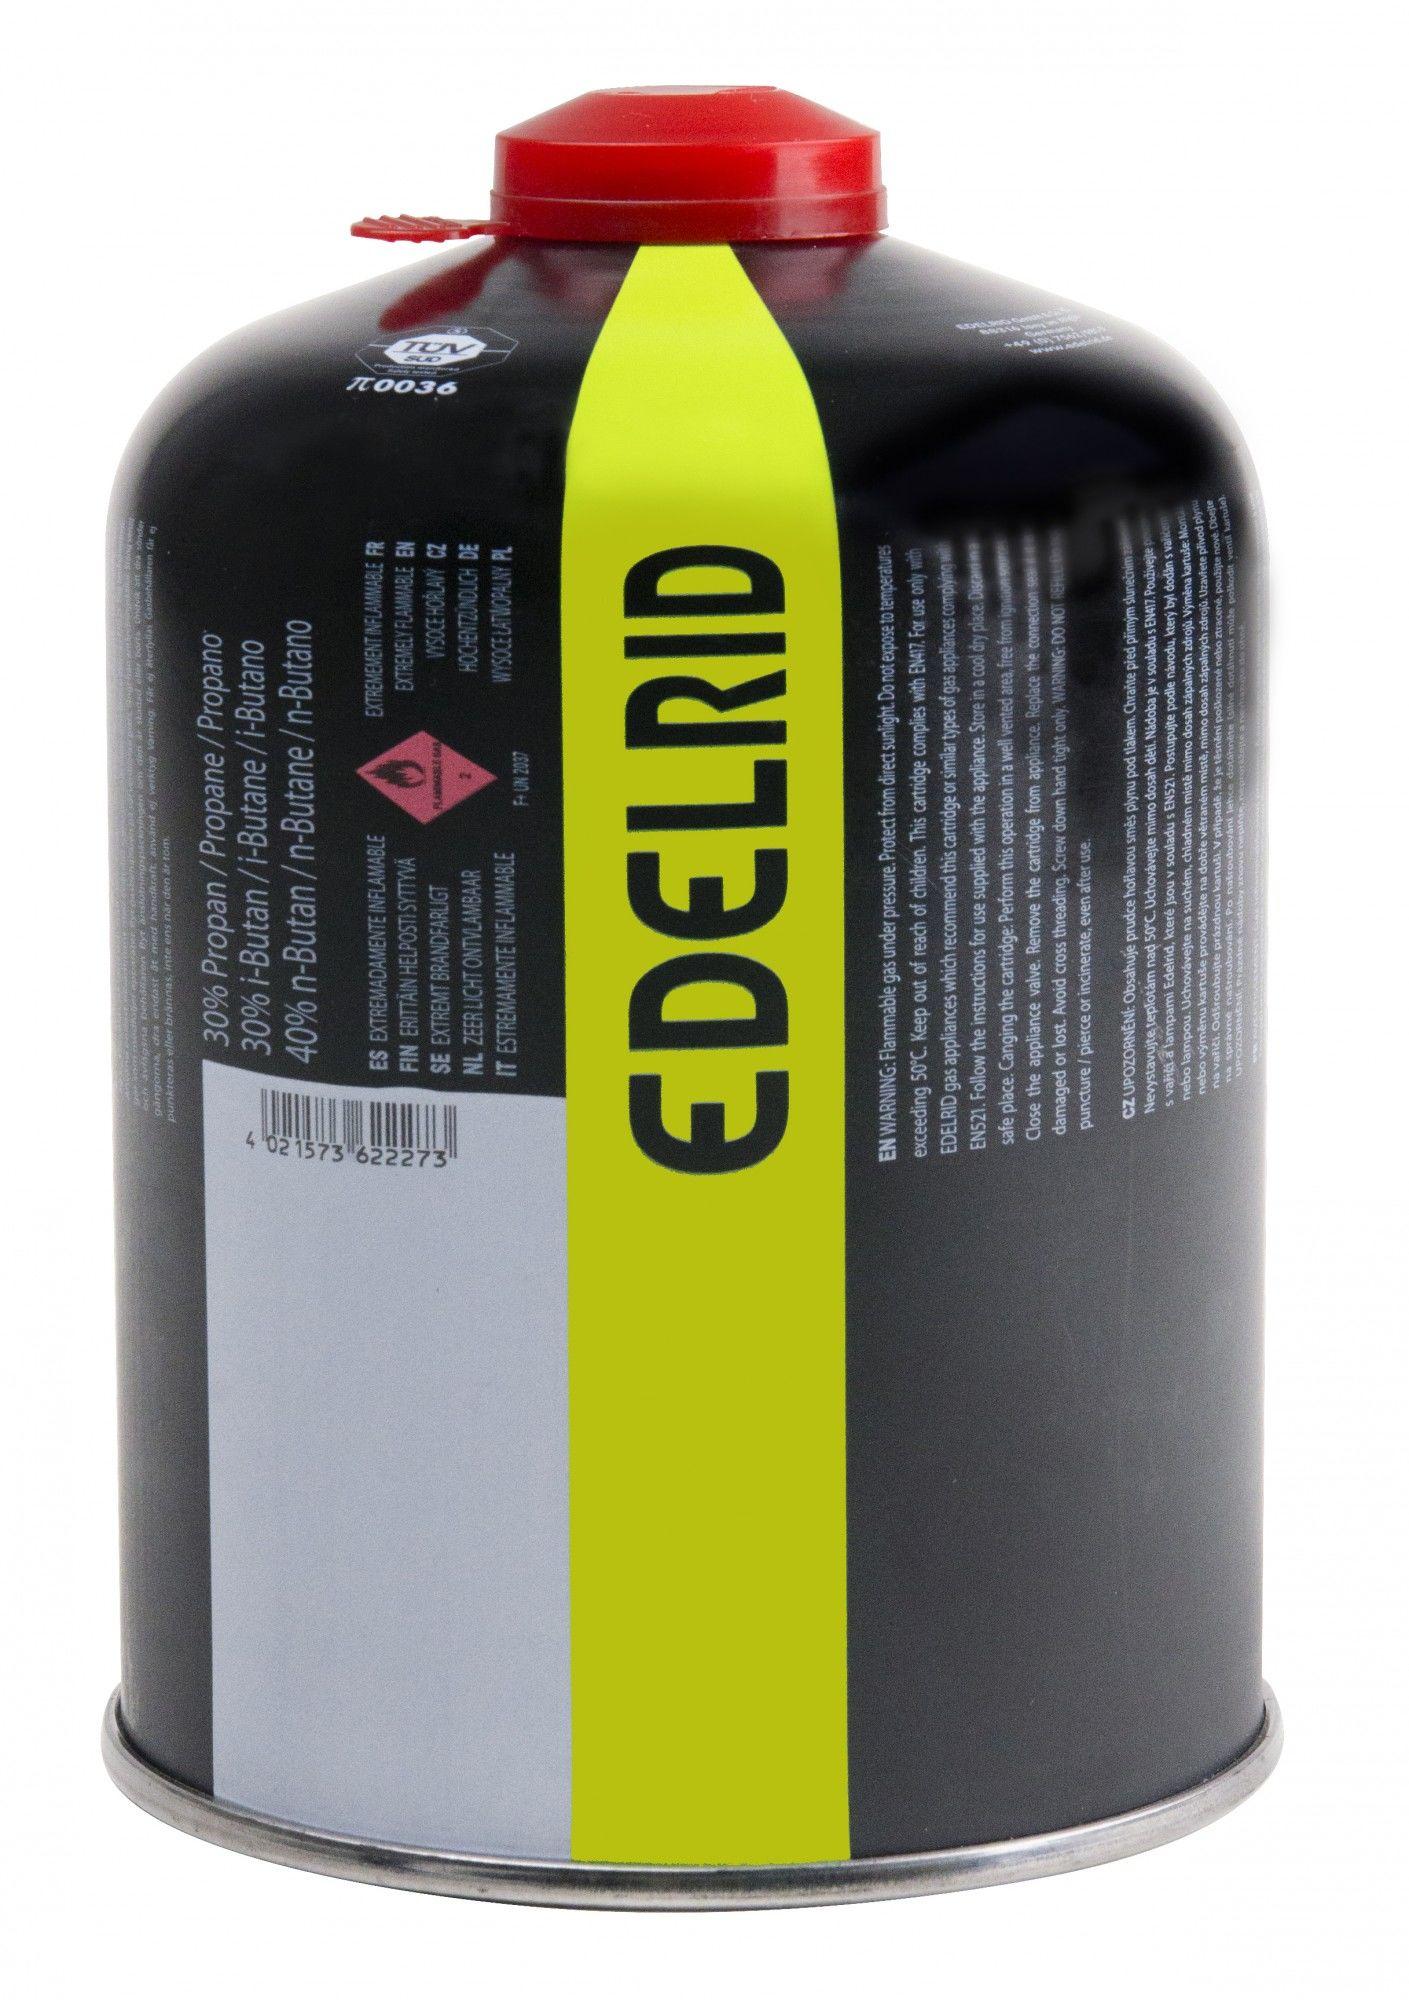 Edelrid Outdoor GAS 450 Schwarz, One Size -Farbe Black, One Size